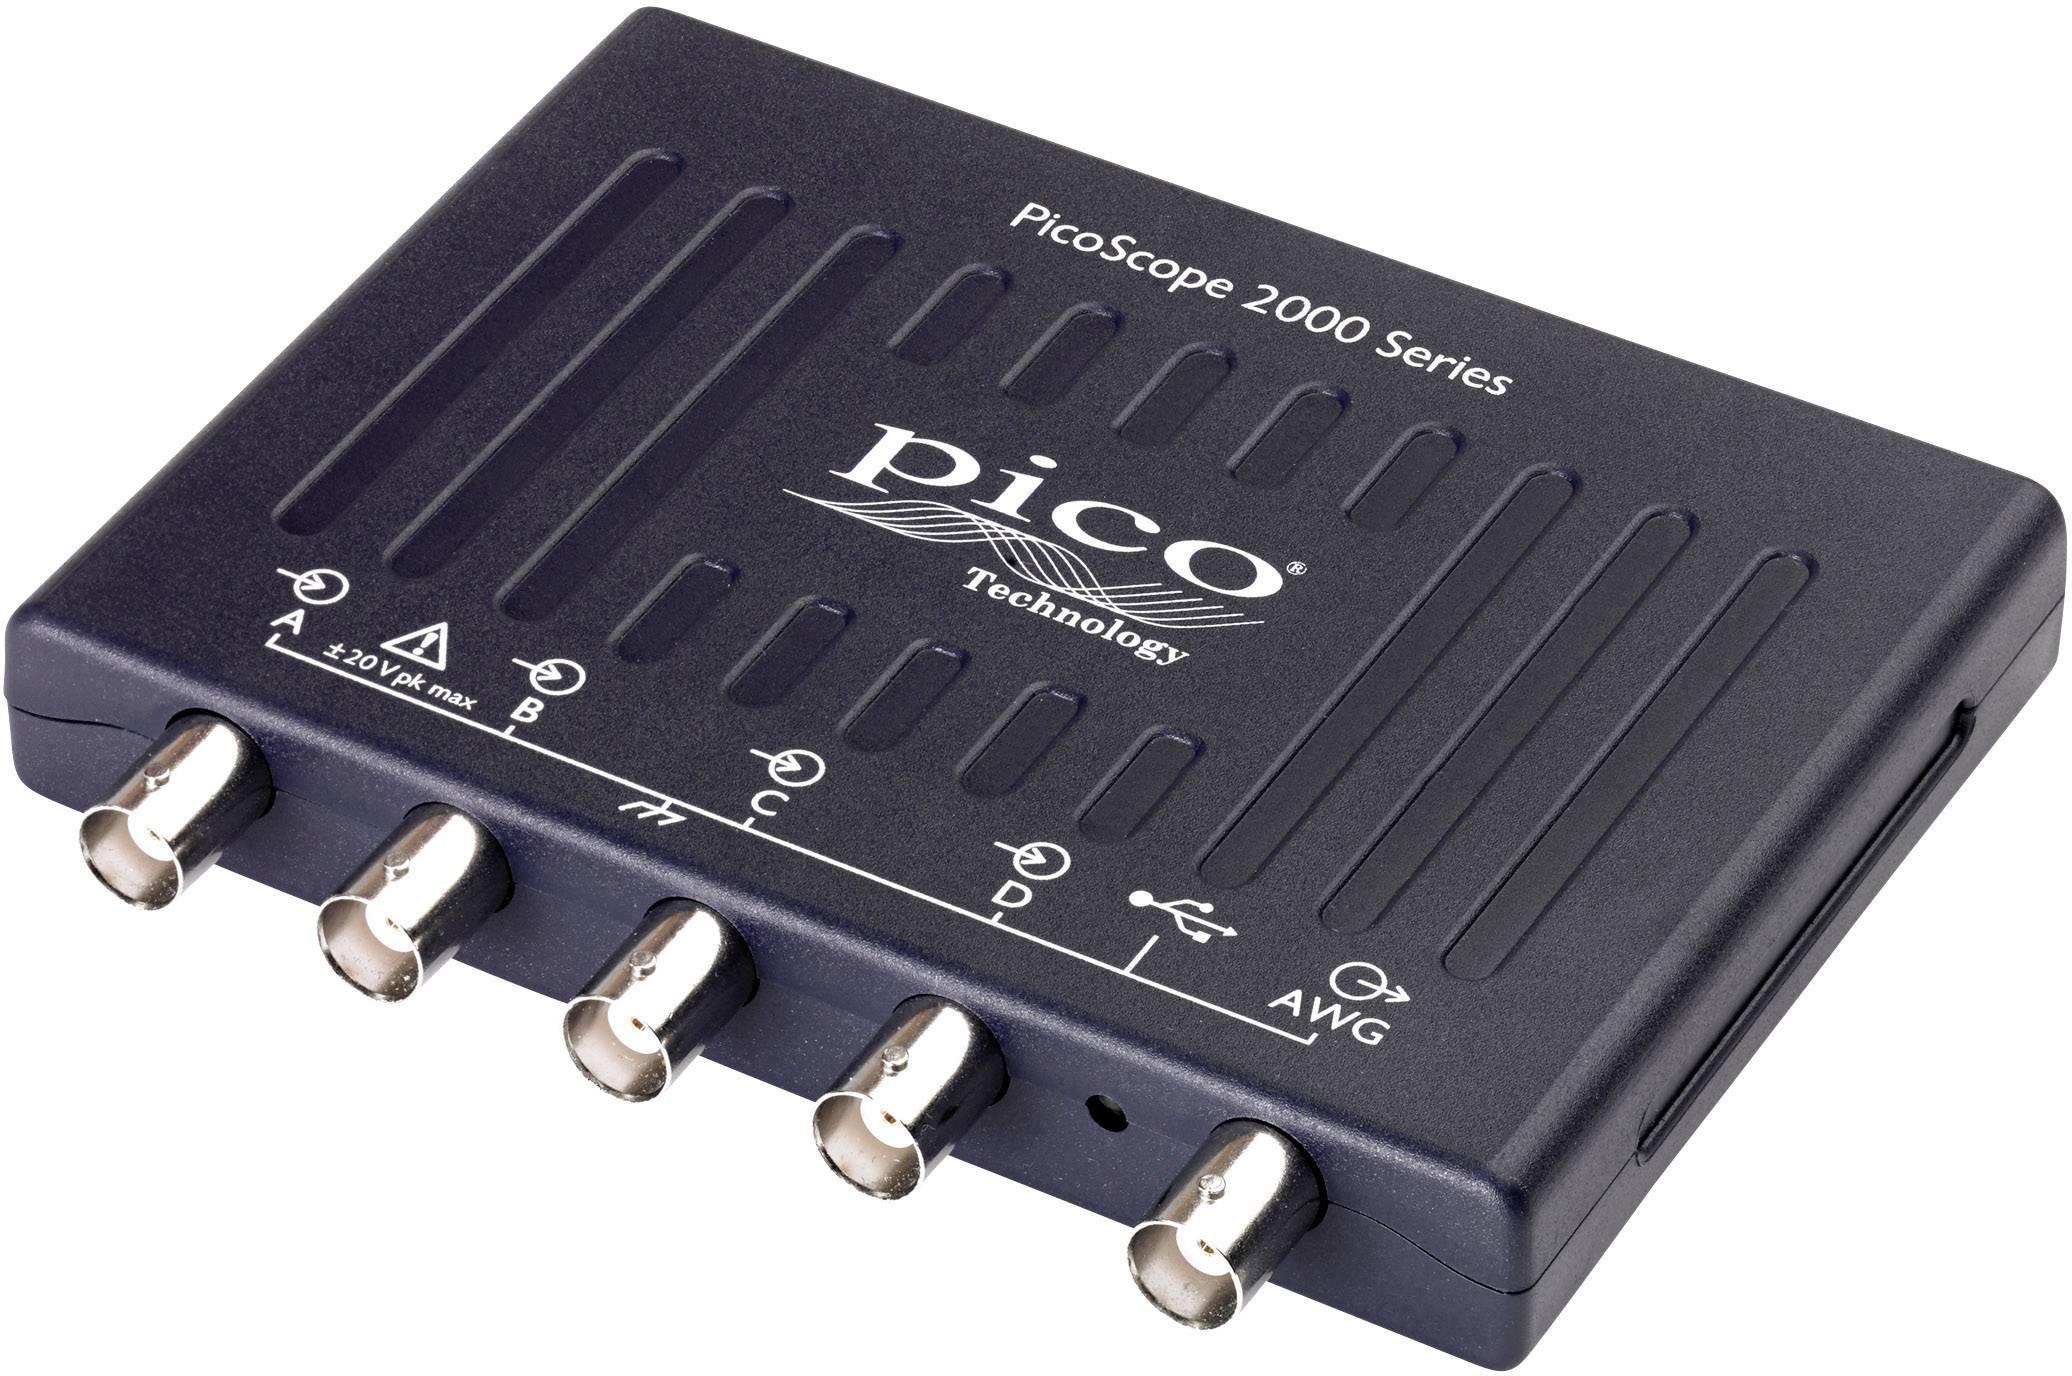 USB osciloskop pico 2405A, 25 MHz, 4kanálová